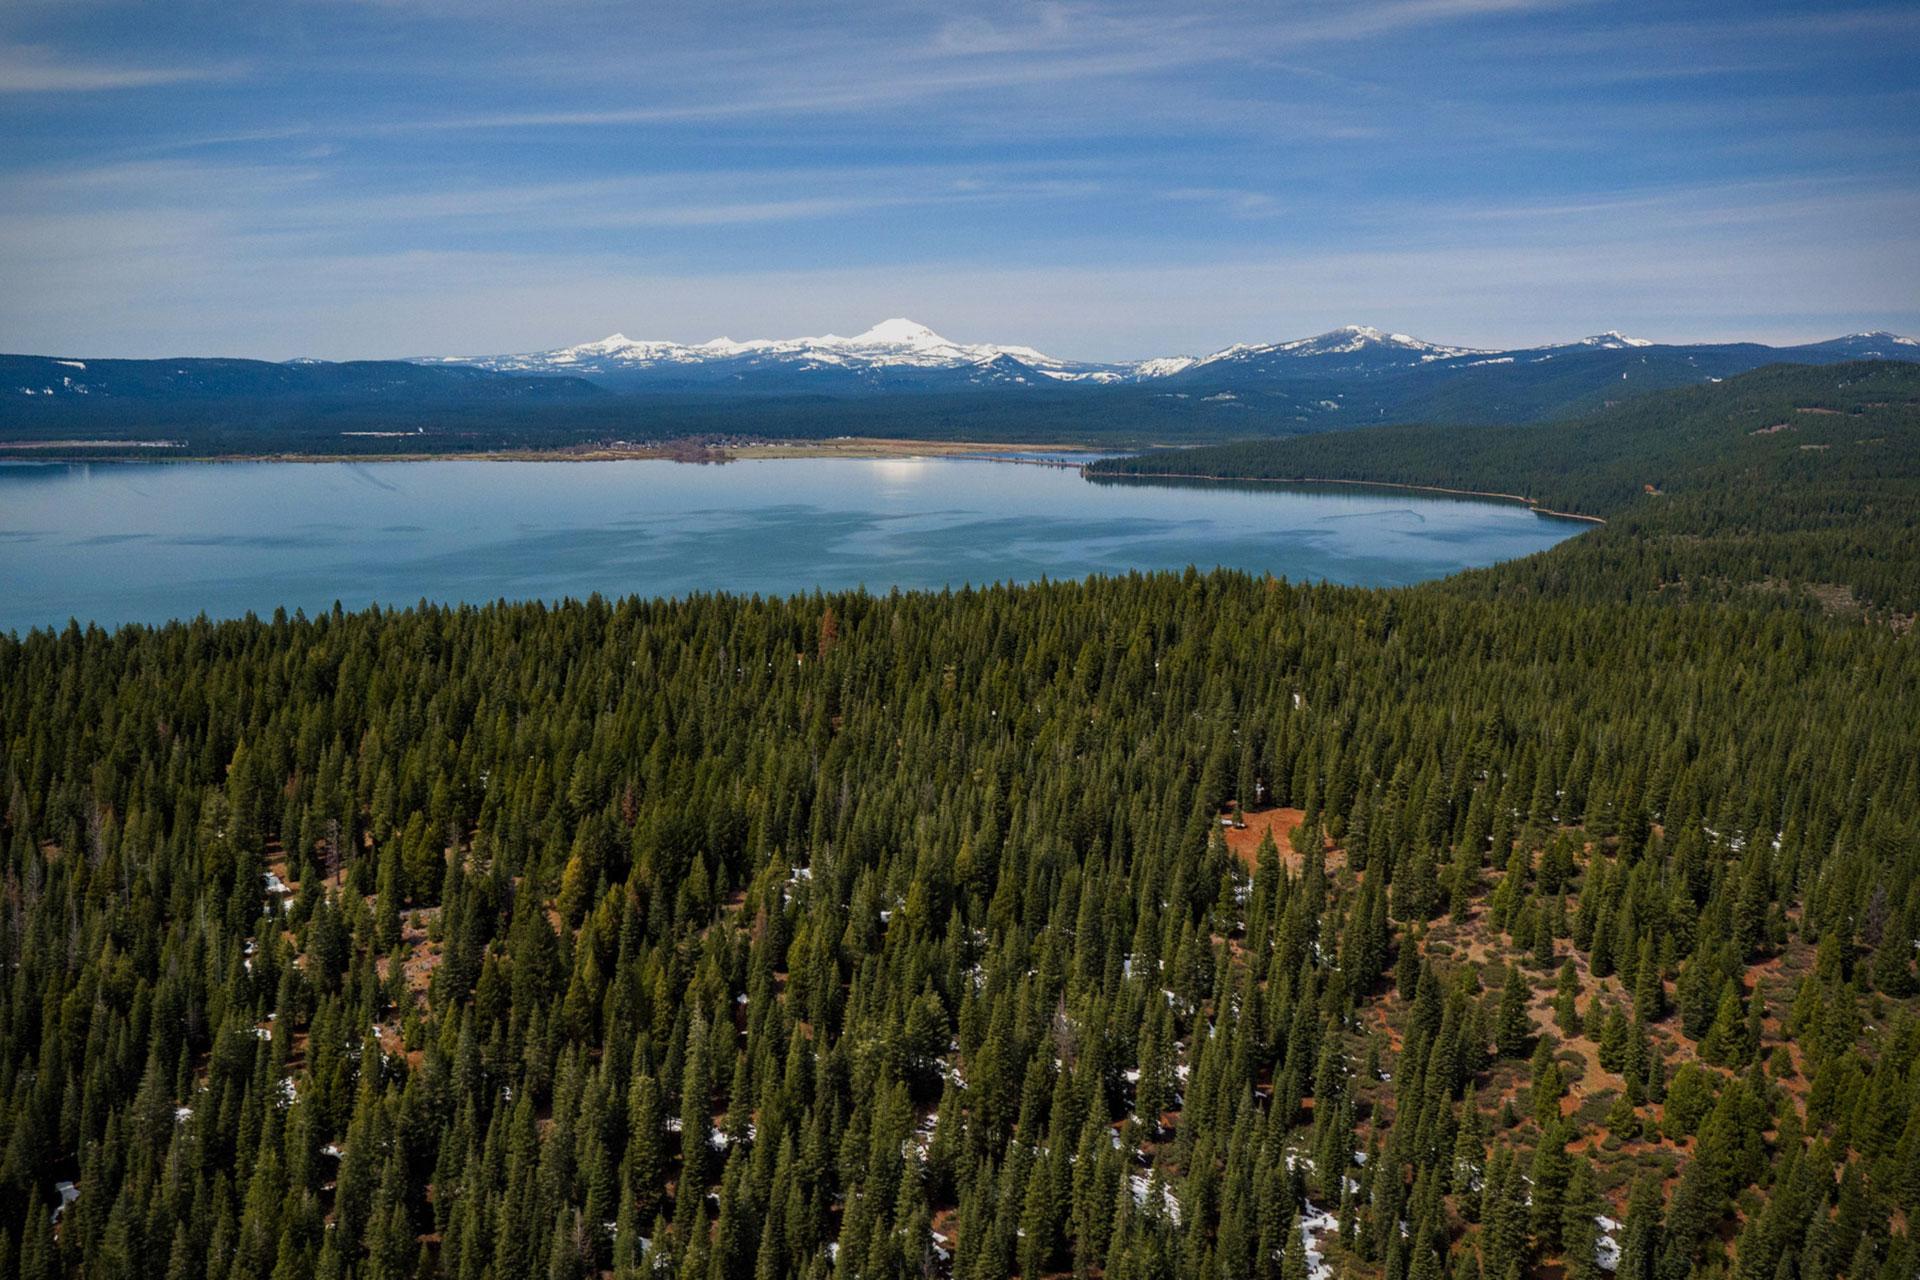 Lake Almanor Shoreline